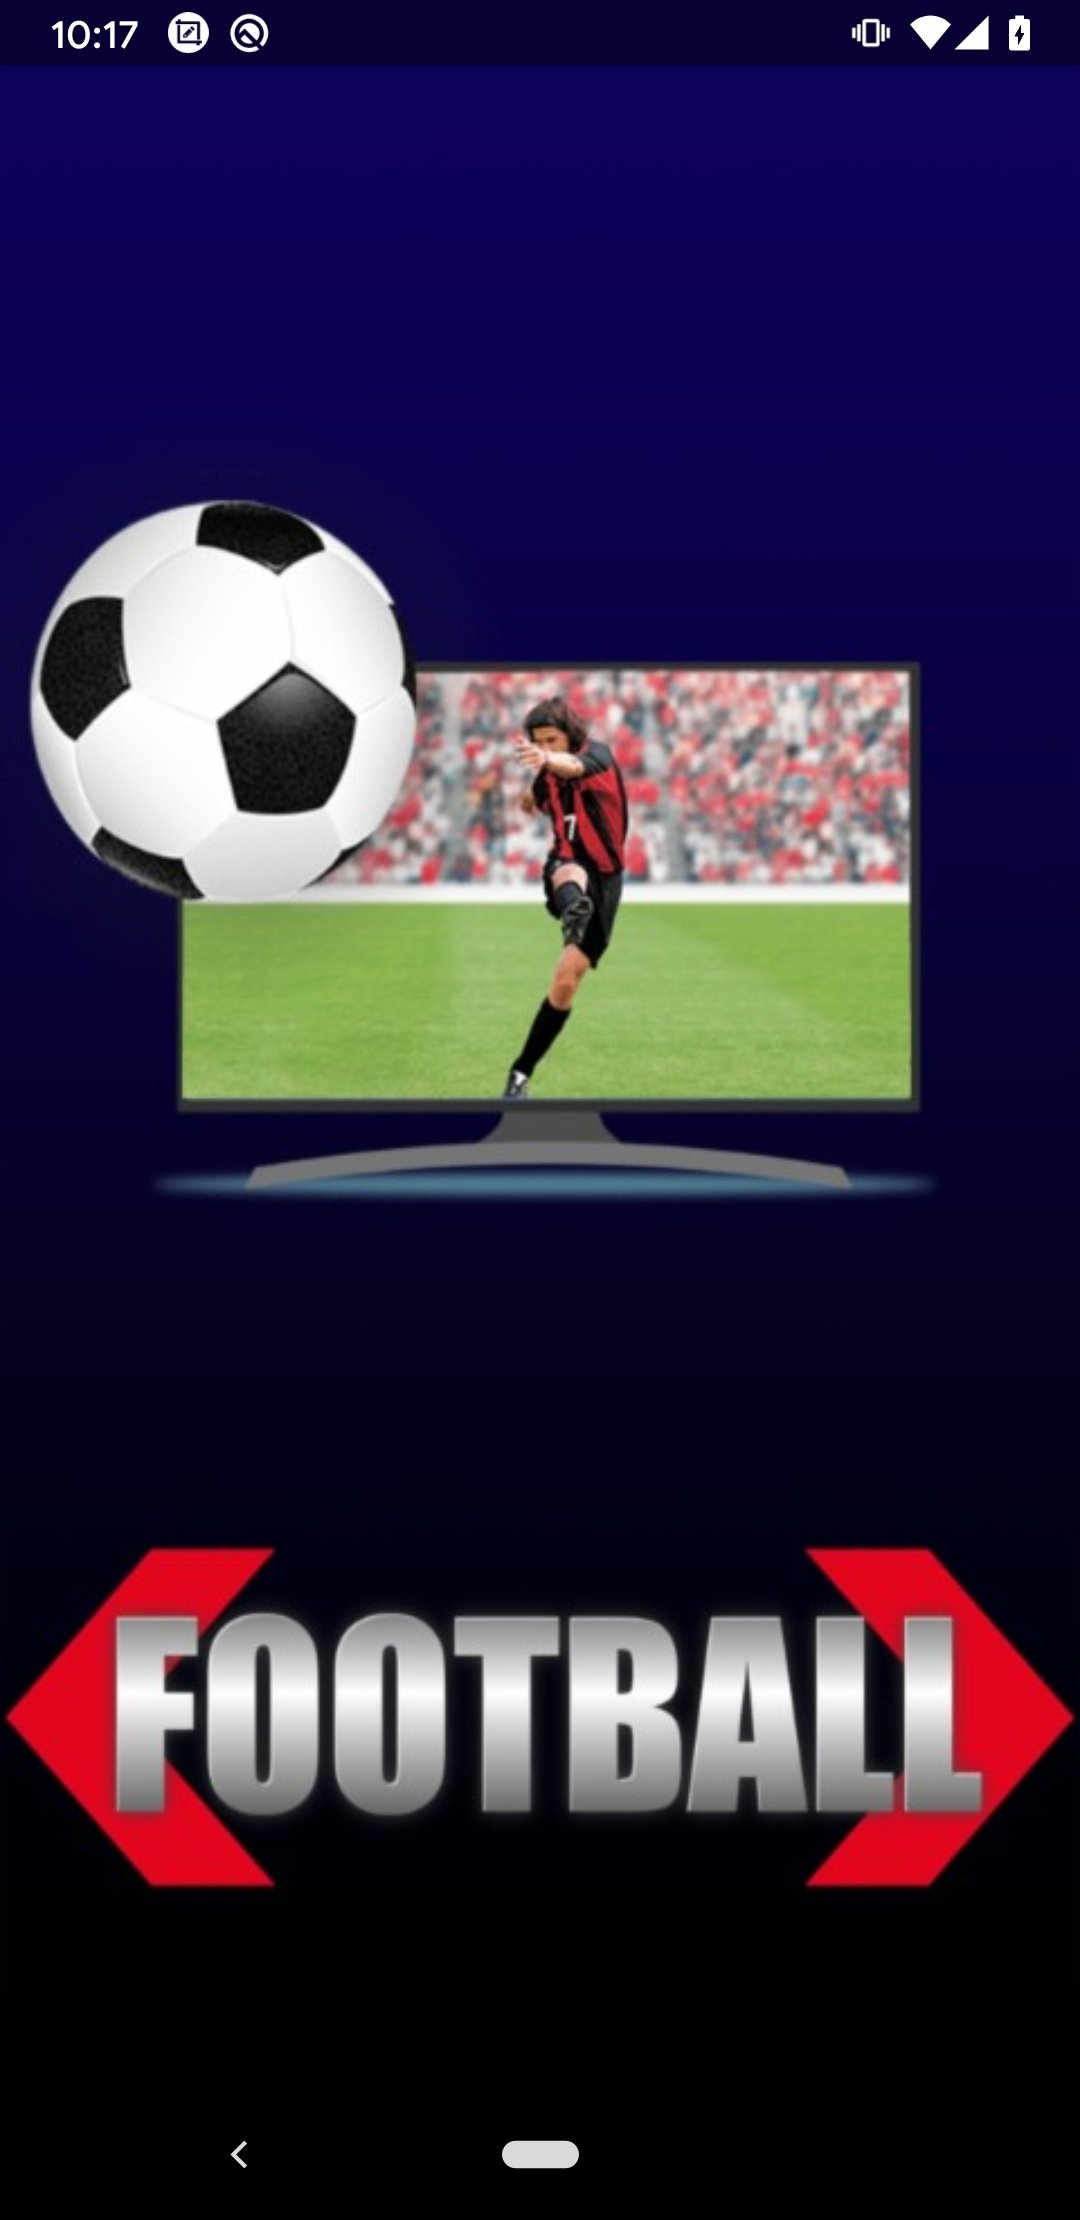 Online sports apparel